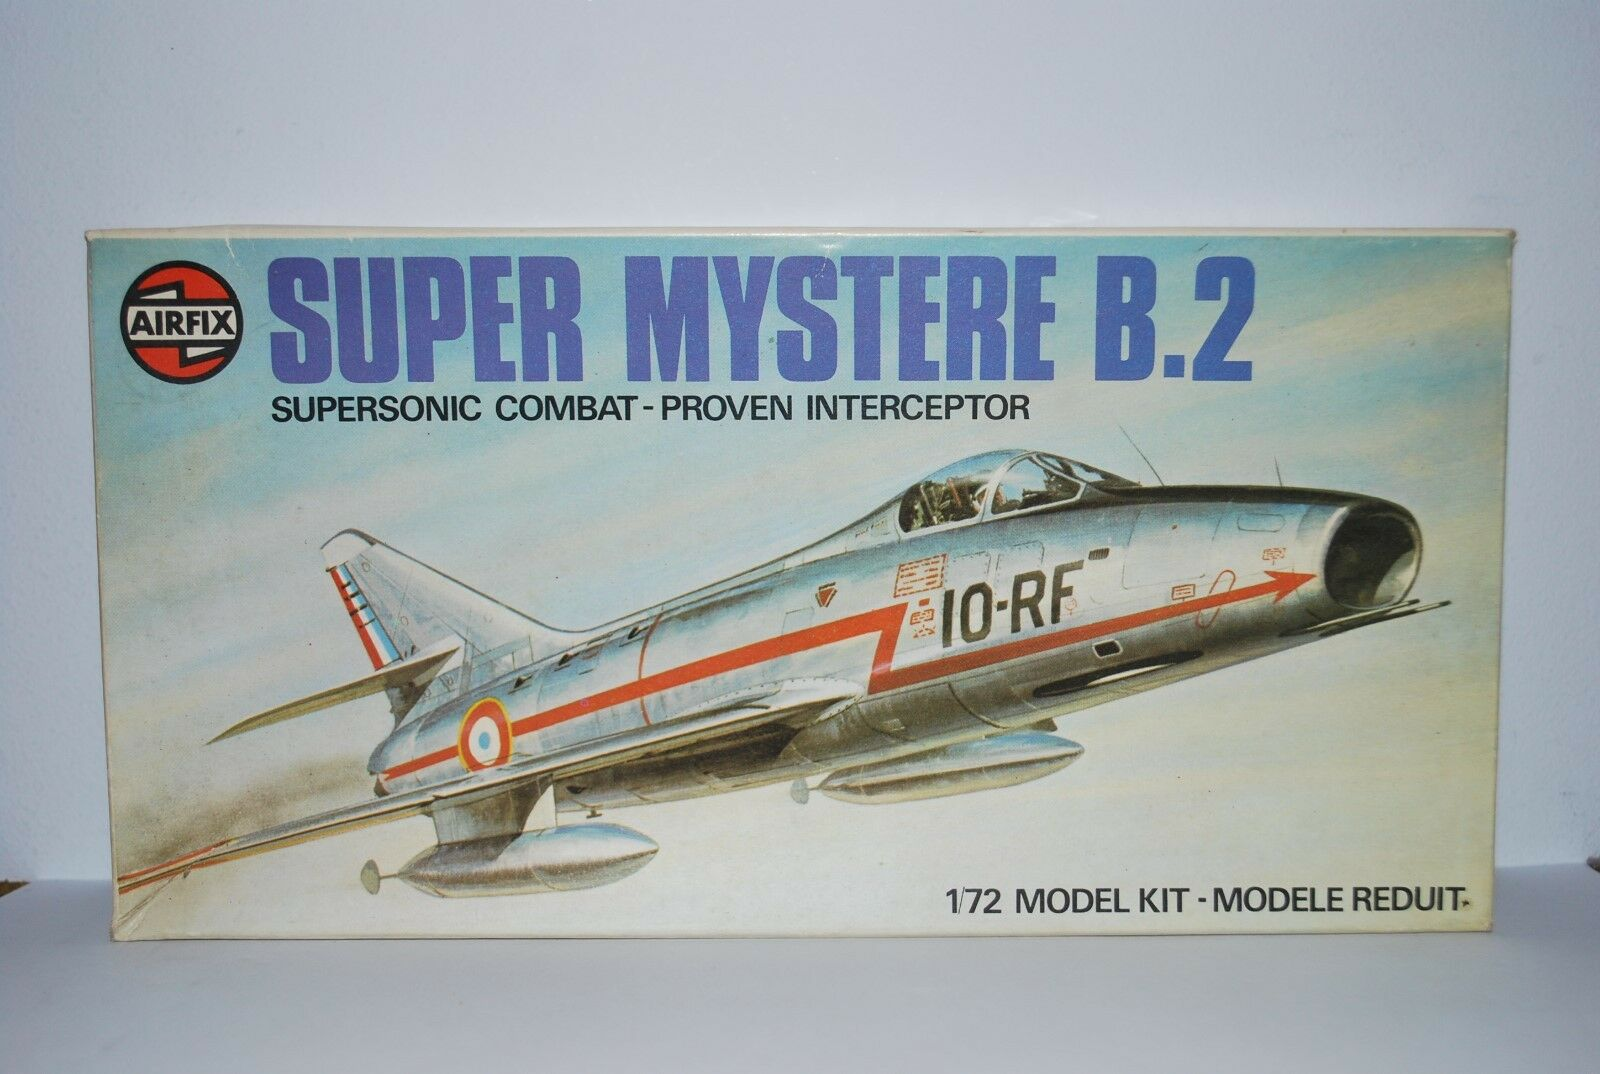 Vintage AirFix Super Mystere B.2 1 72 Scale Model, Rare.